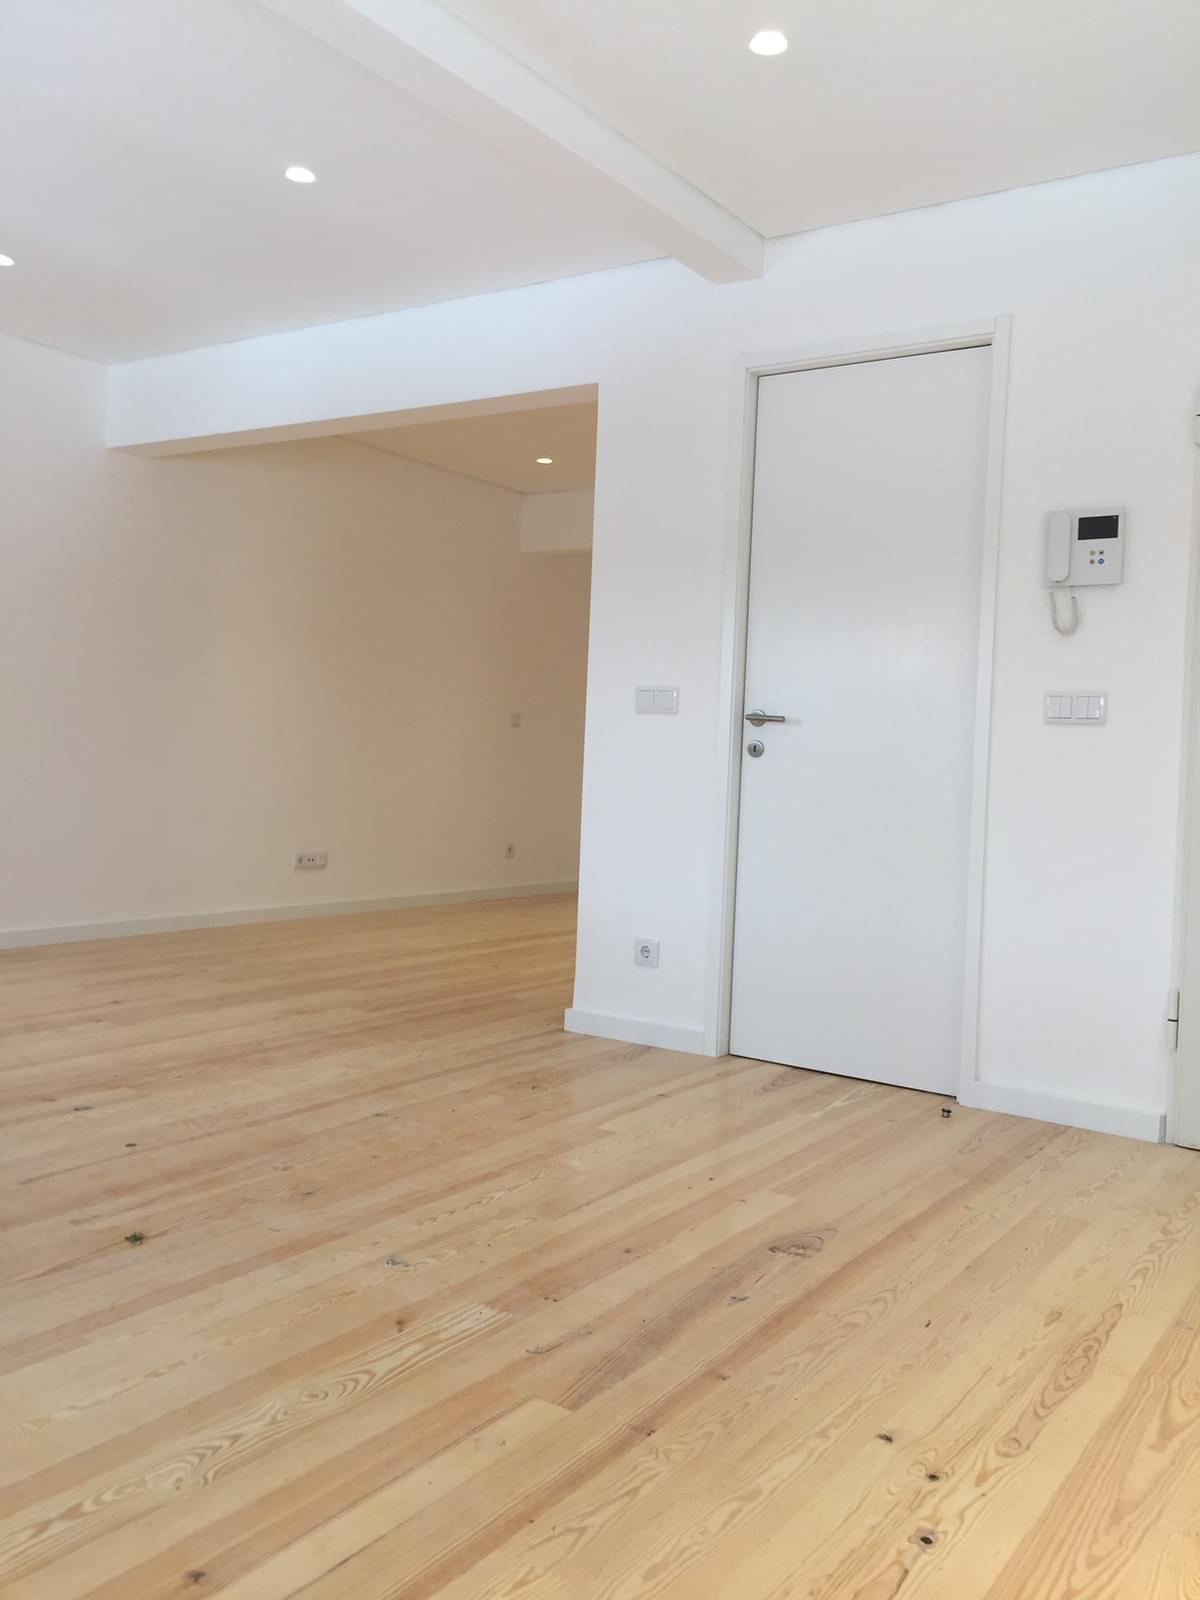 pf18802-apartamento-t1-lisboa-31d1fc9c-8a7a-455a-a9ca-9eab1ac00ea6